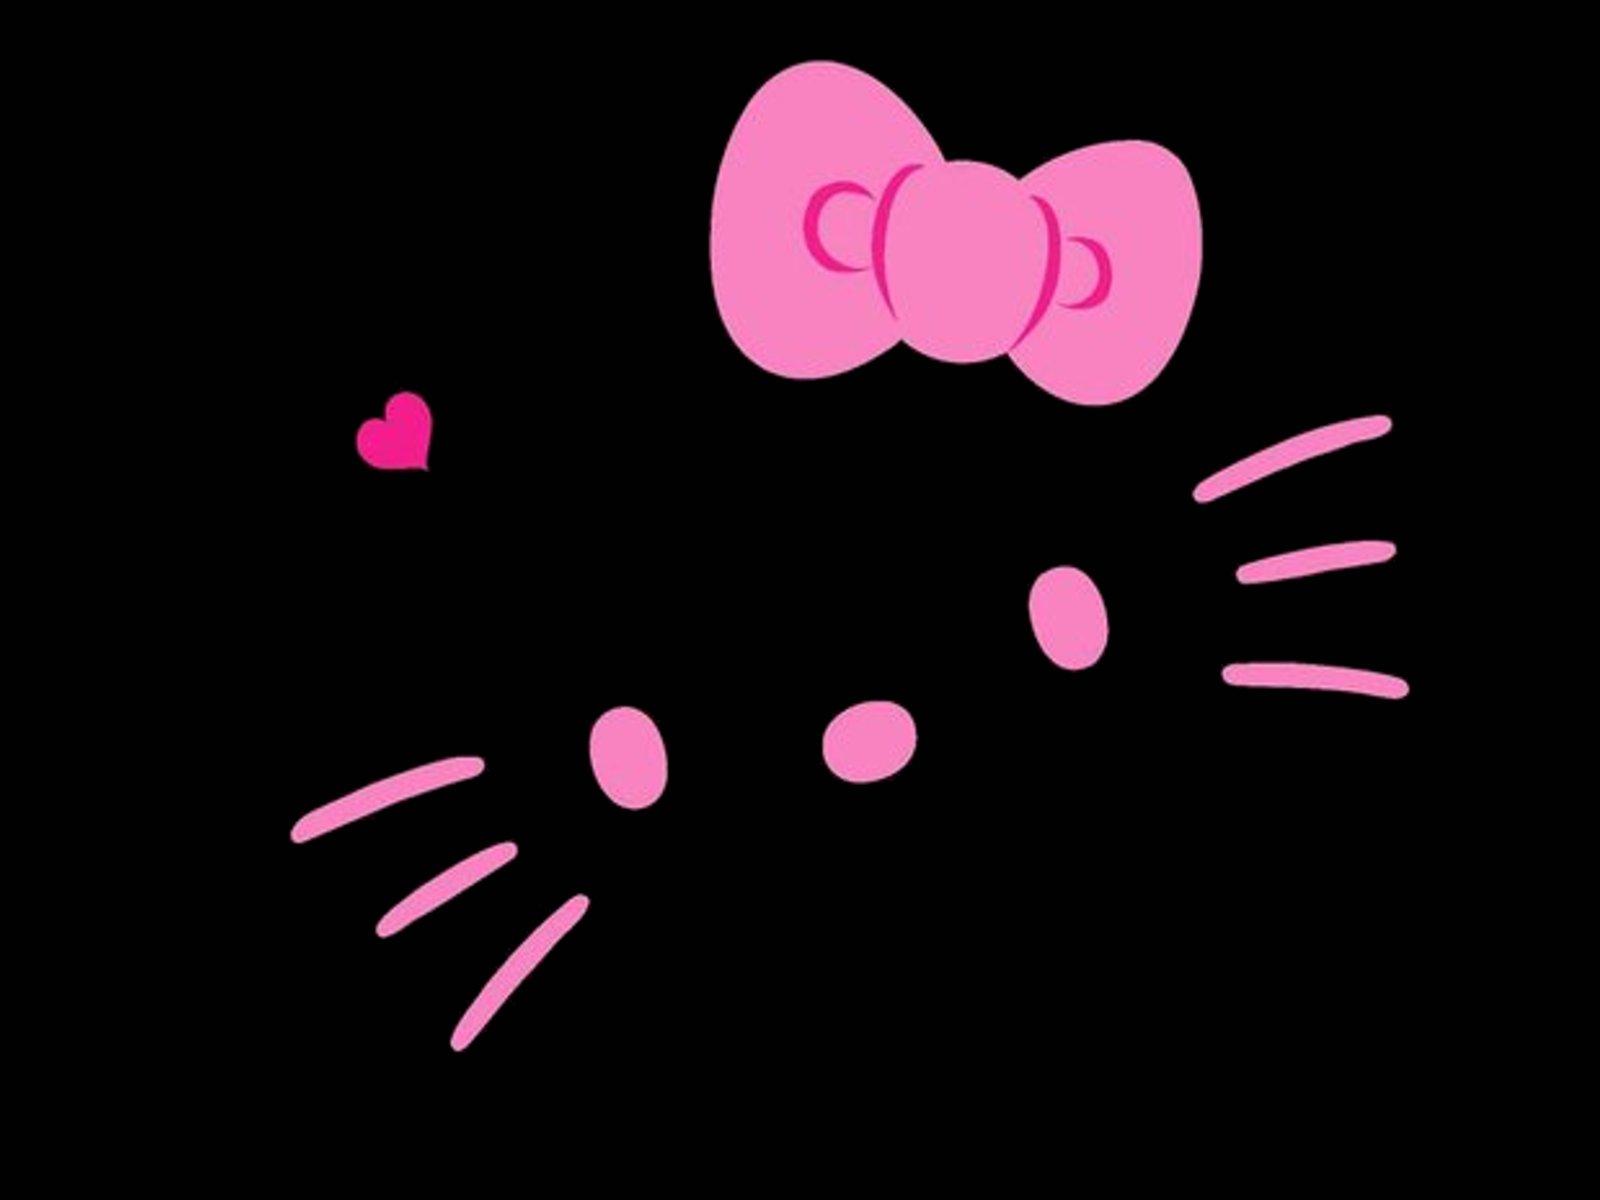 Must see Wallpaper Hello Kitty Glitter - hello+kitty+free+wallpaper+%25282%2529  Pic_691924.jpg